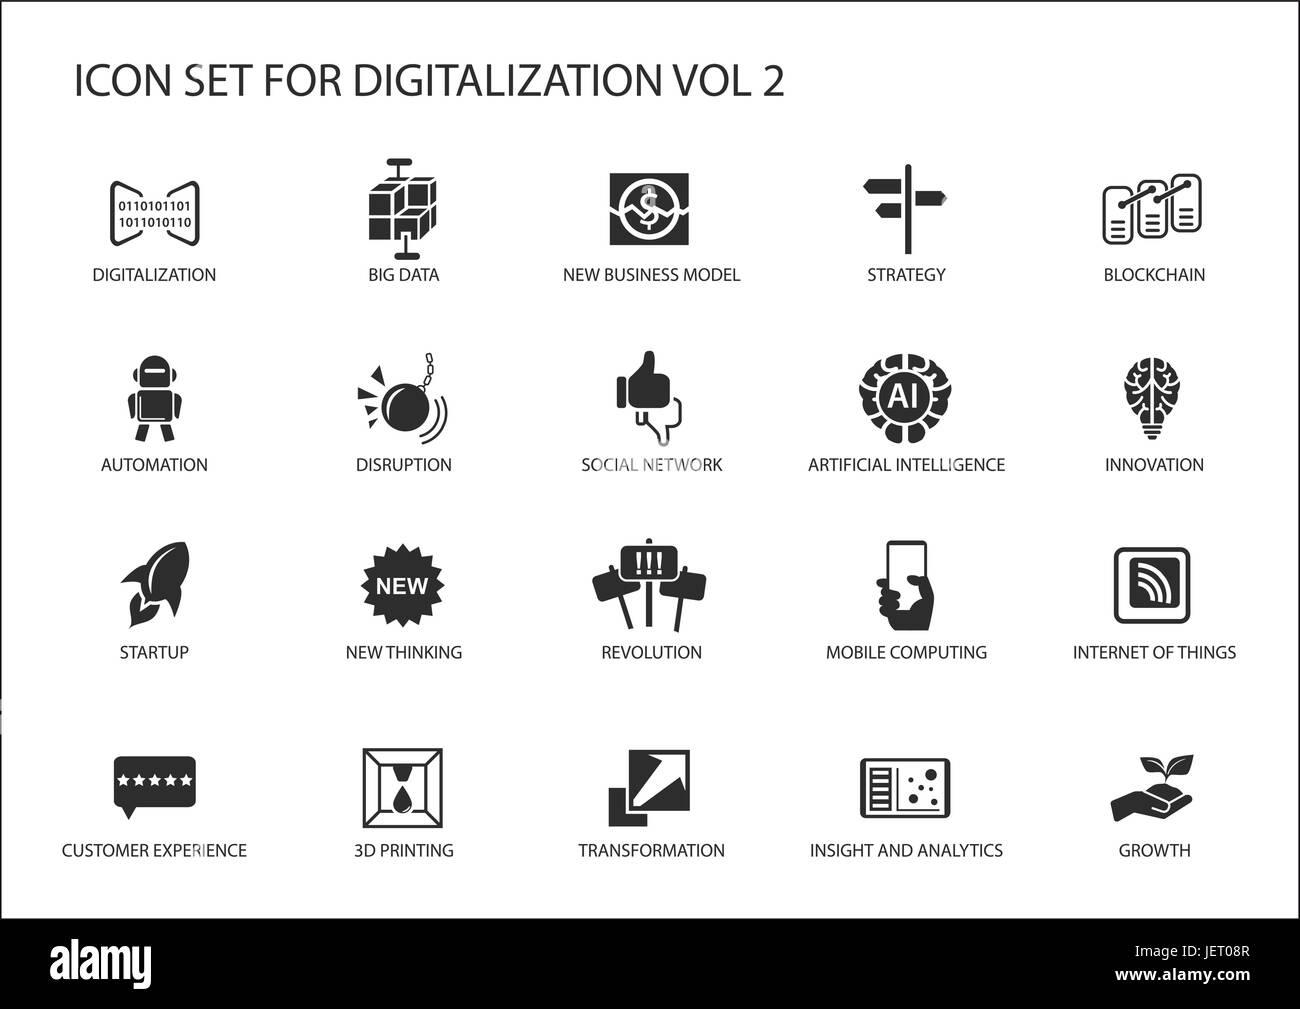 Digitalization Icon Vector Set For Topics Like Big Data Business